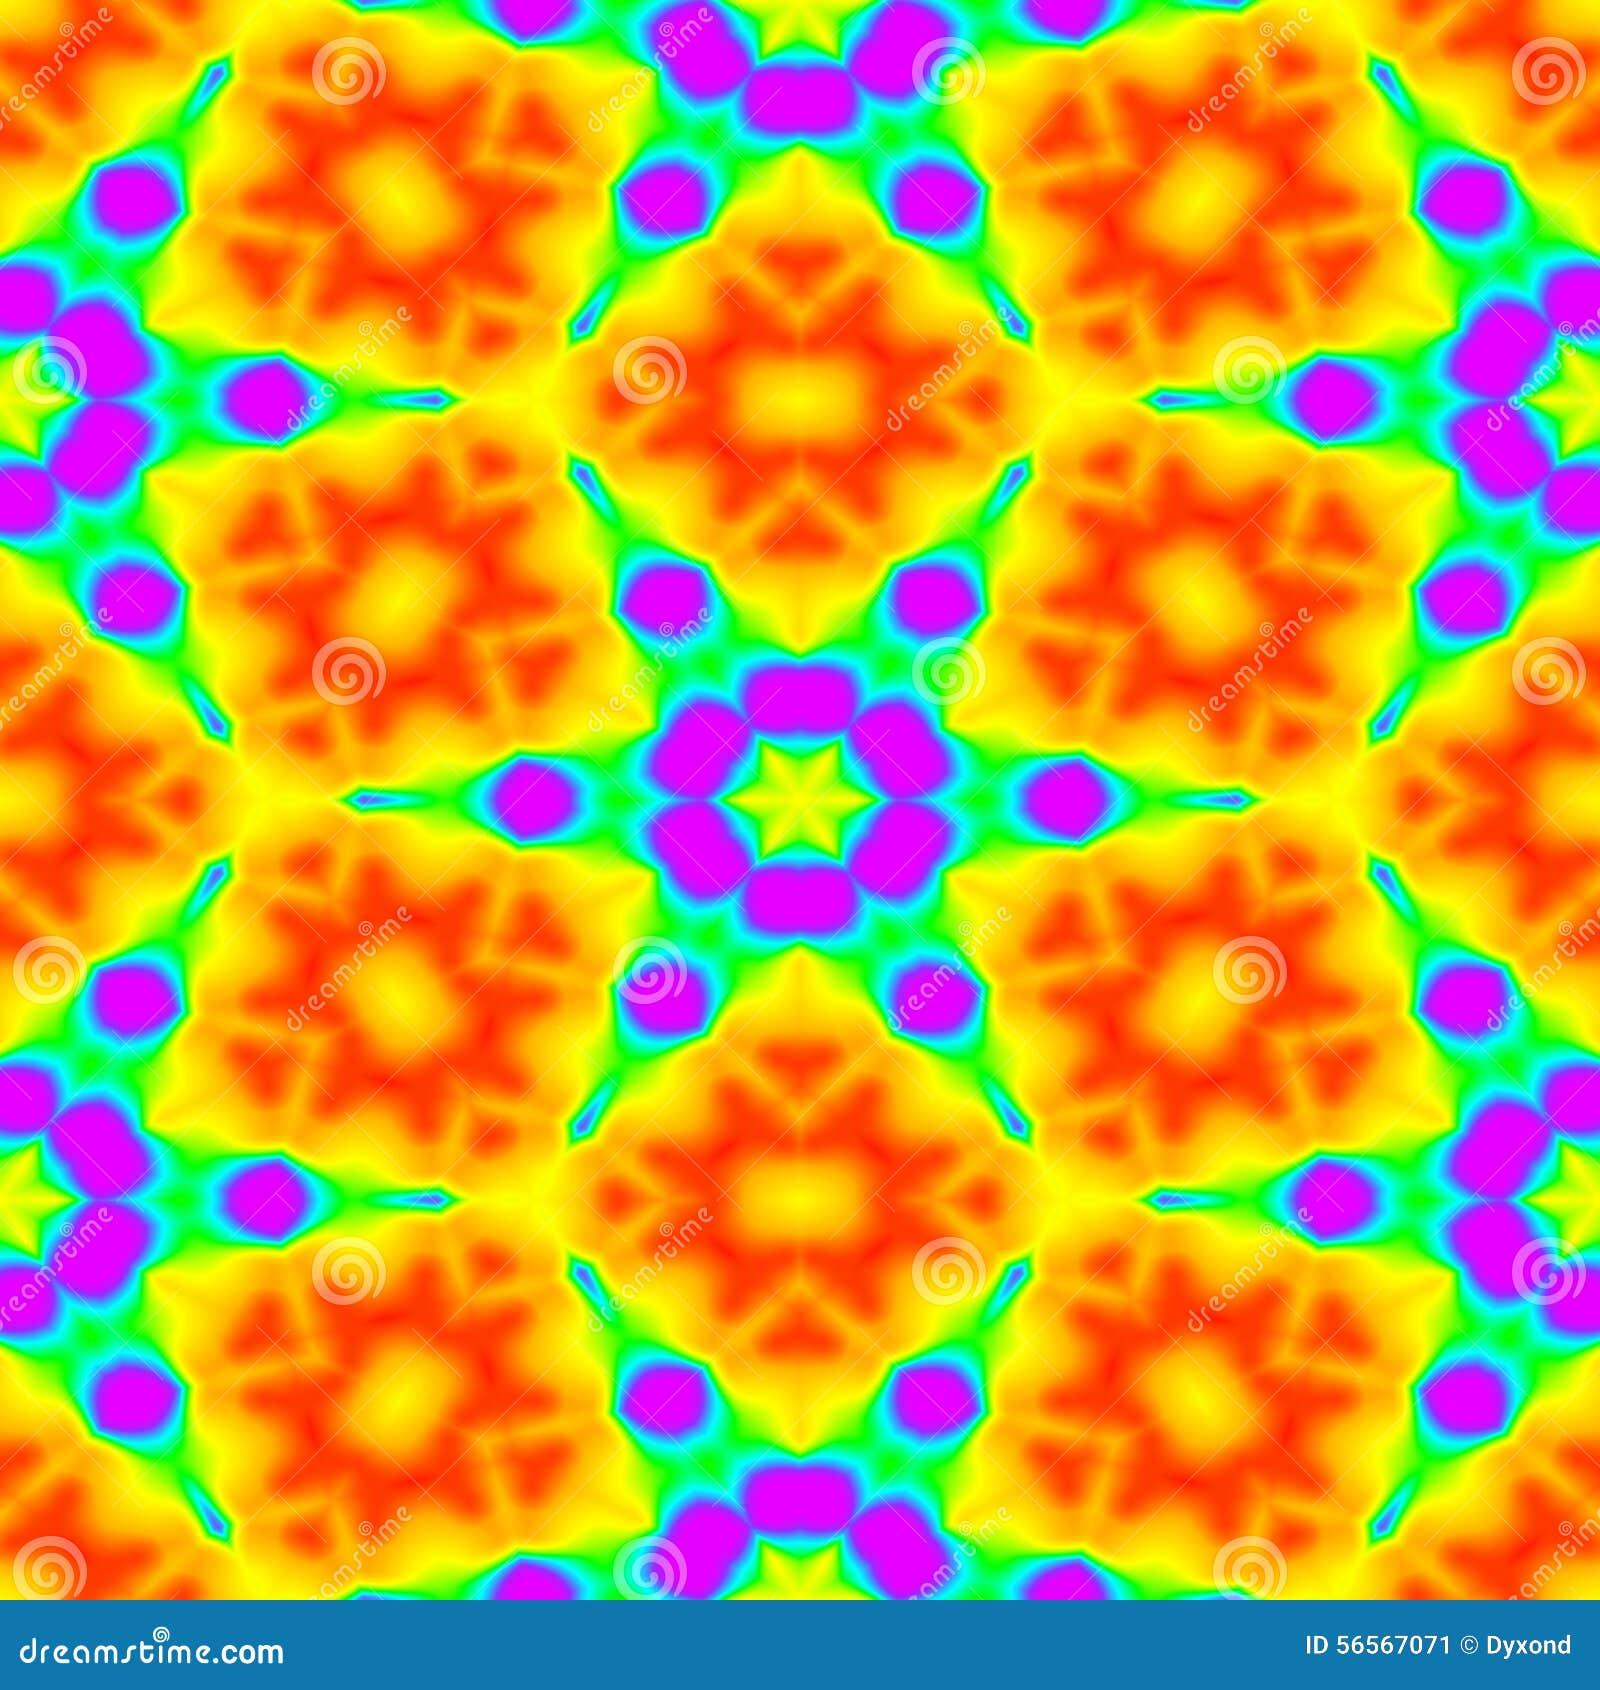 Download αφηρημένο ζωηρόχρωμο πρότυπο σχοινί απεικόνισης άνευ ρ&a Απεικόνιση αποθεμάτων - εικονογραφία από επανάληψη, πολύχρωμος: 56567071